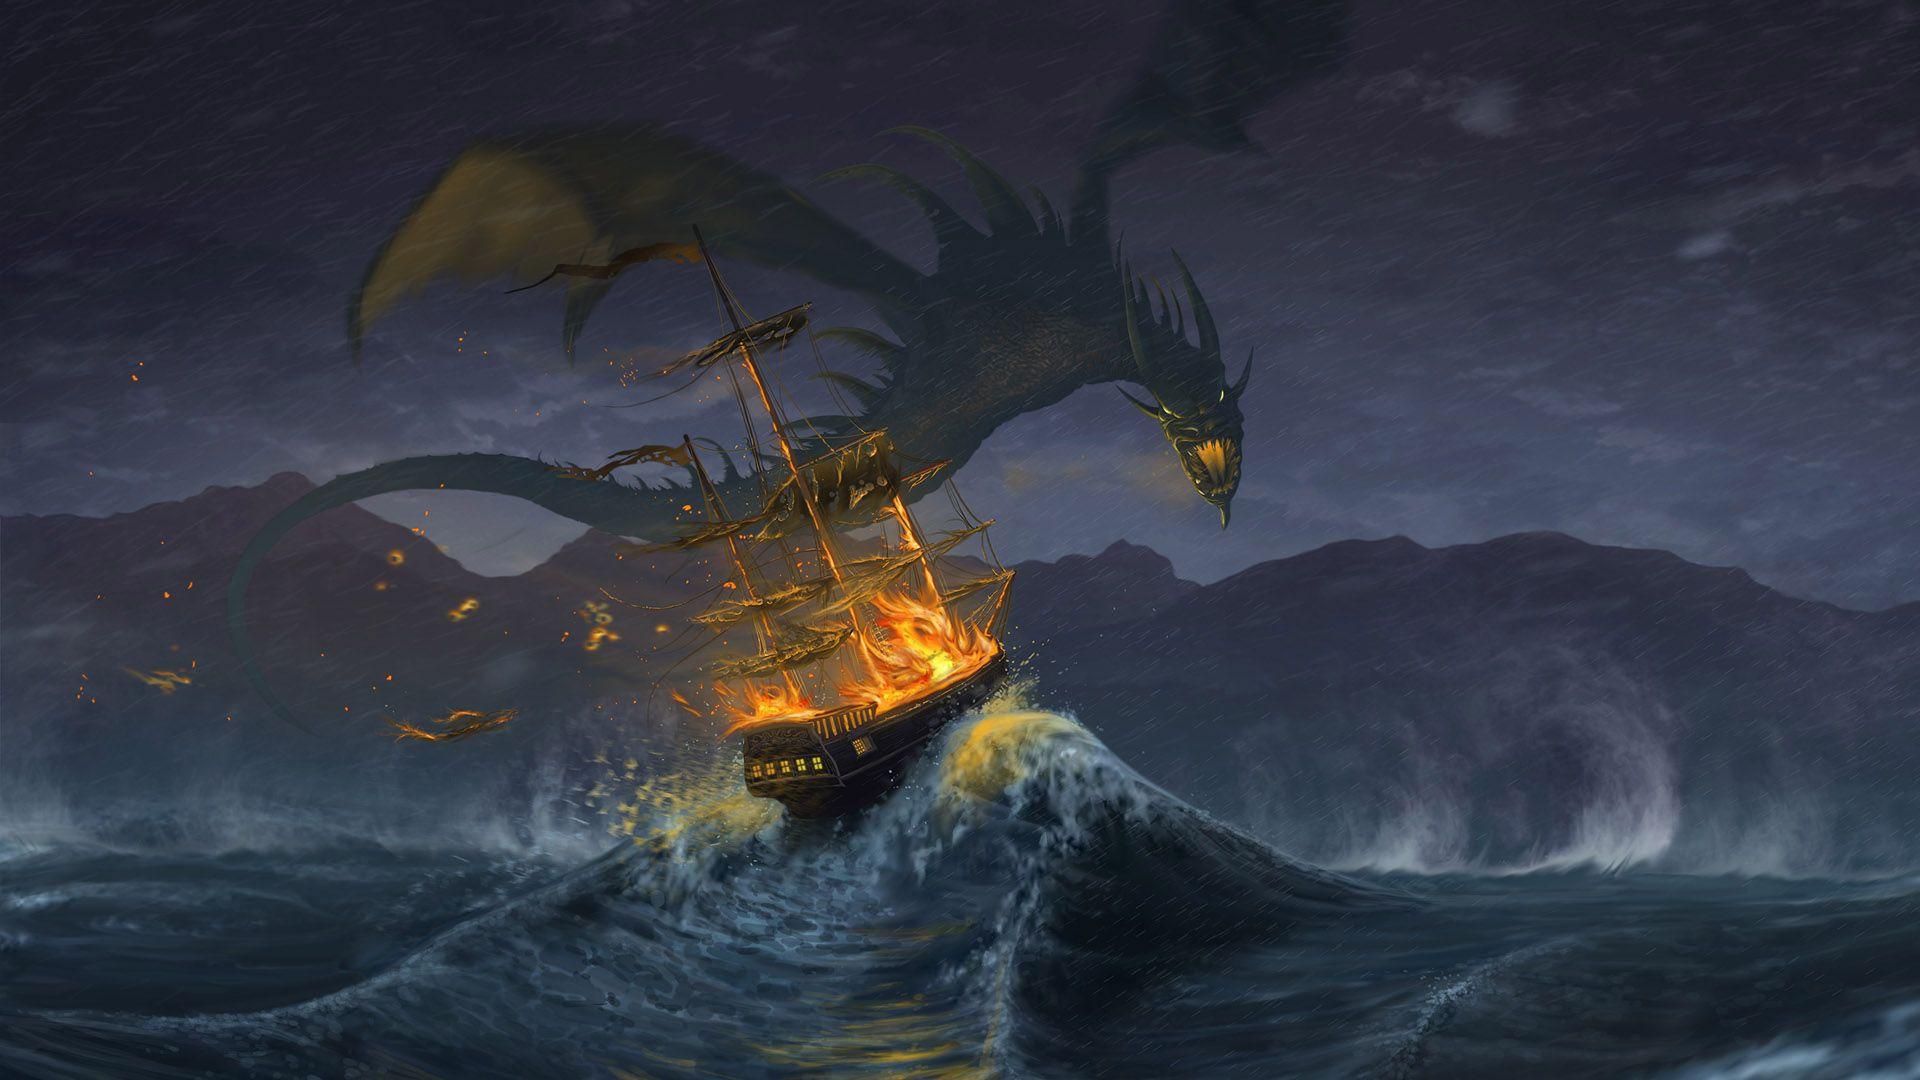 Fantasy Dragon Wallpaper Dragons In 2019 Dragon Fantasy